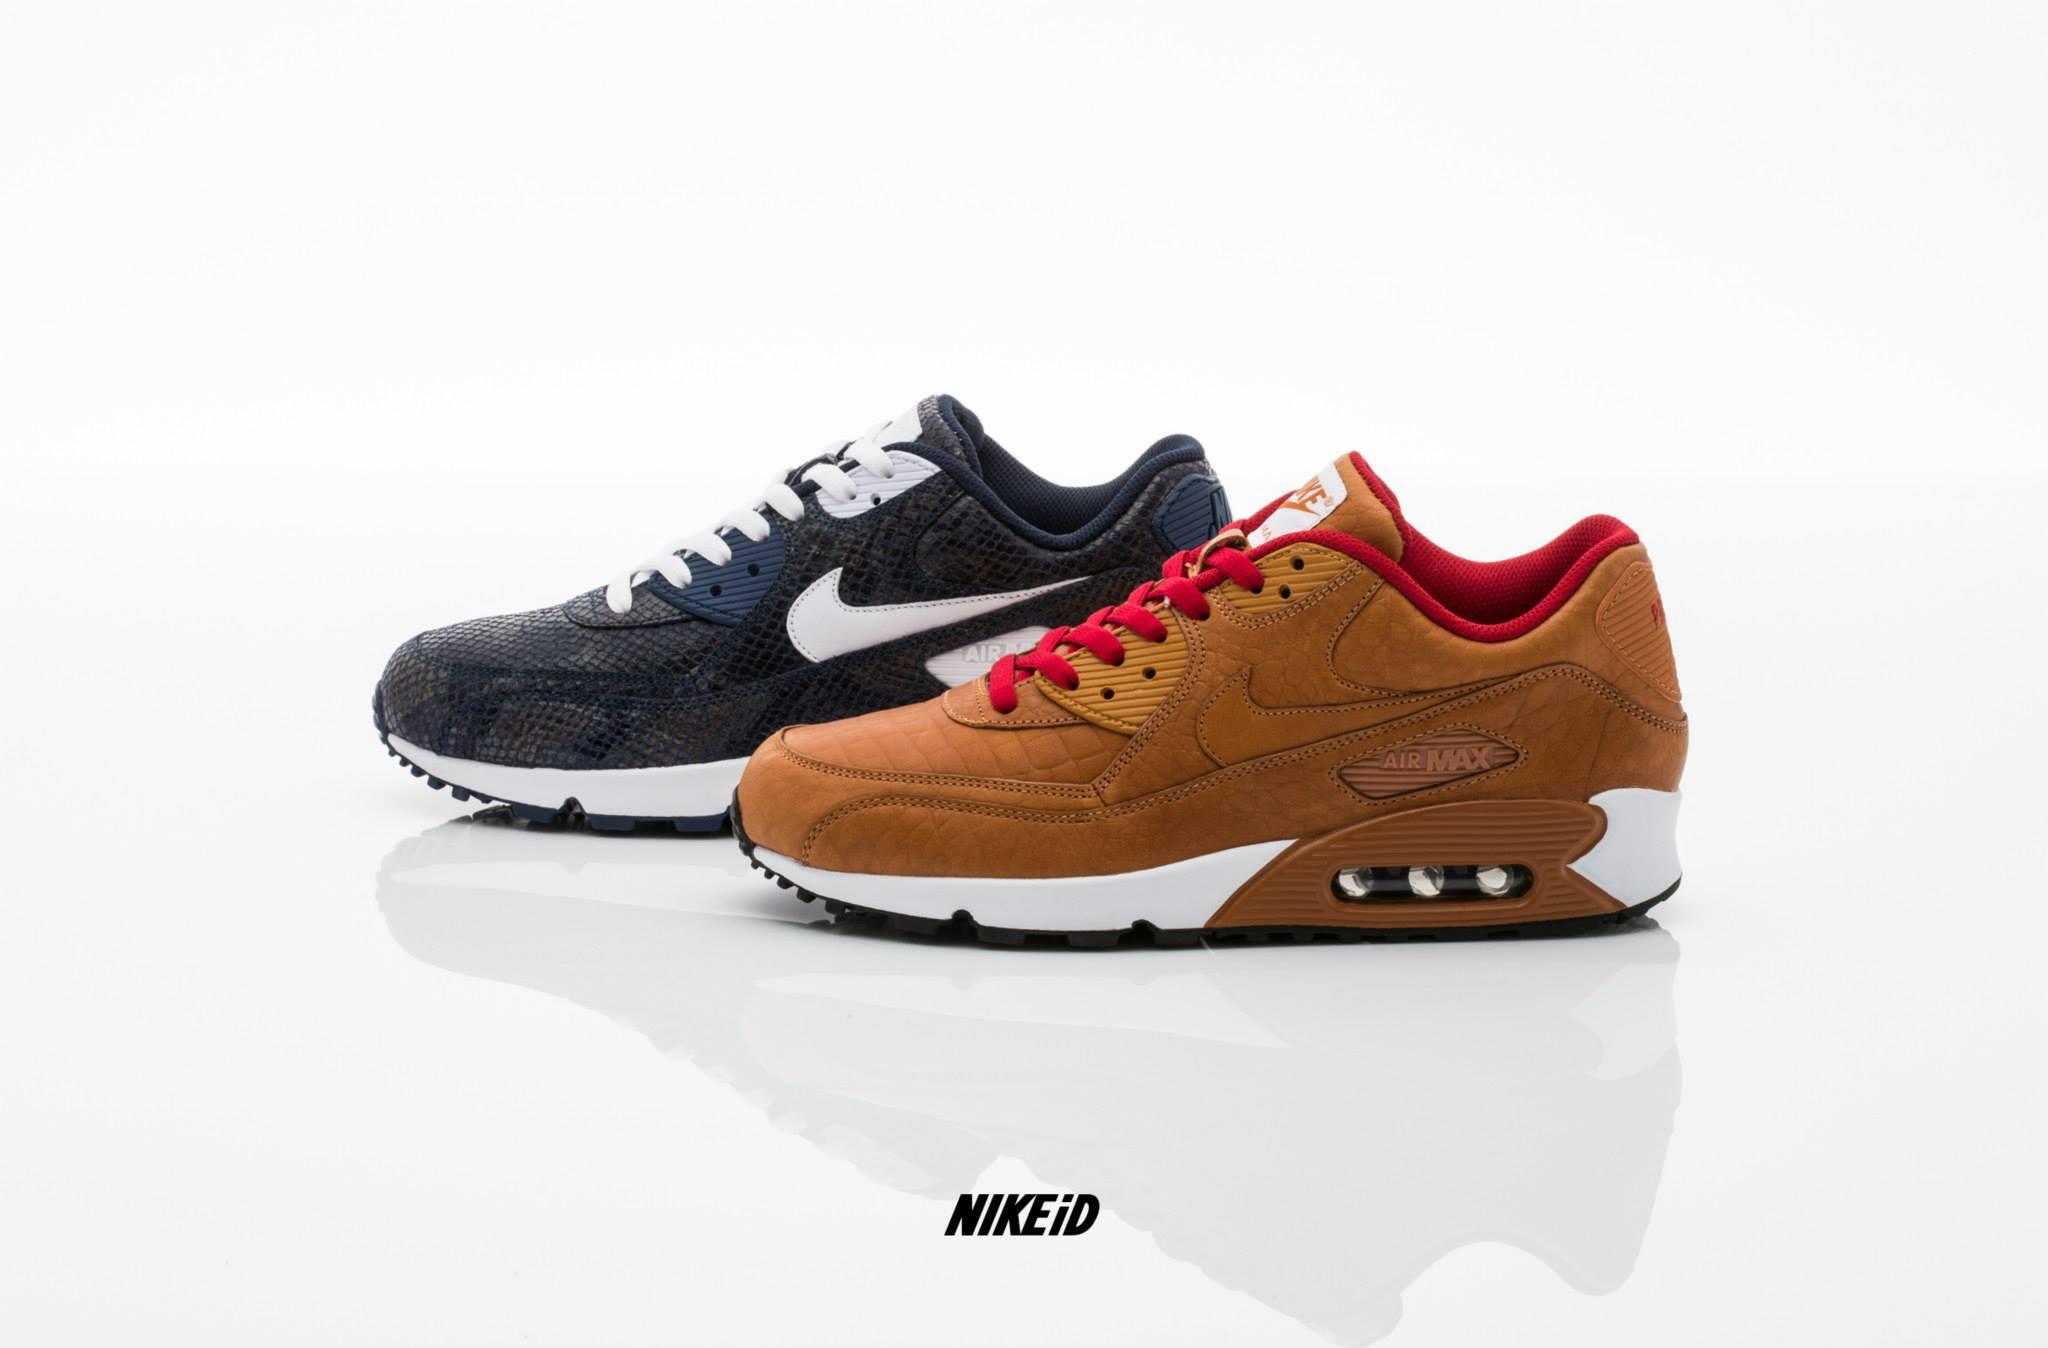 Nike Air Max 90 Premium iD - Options Snake & Croc